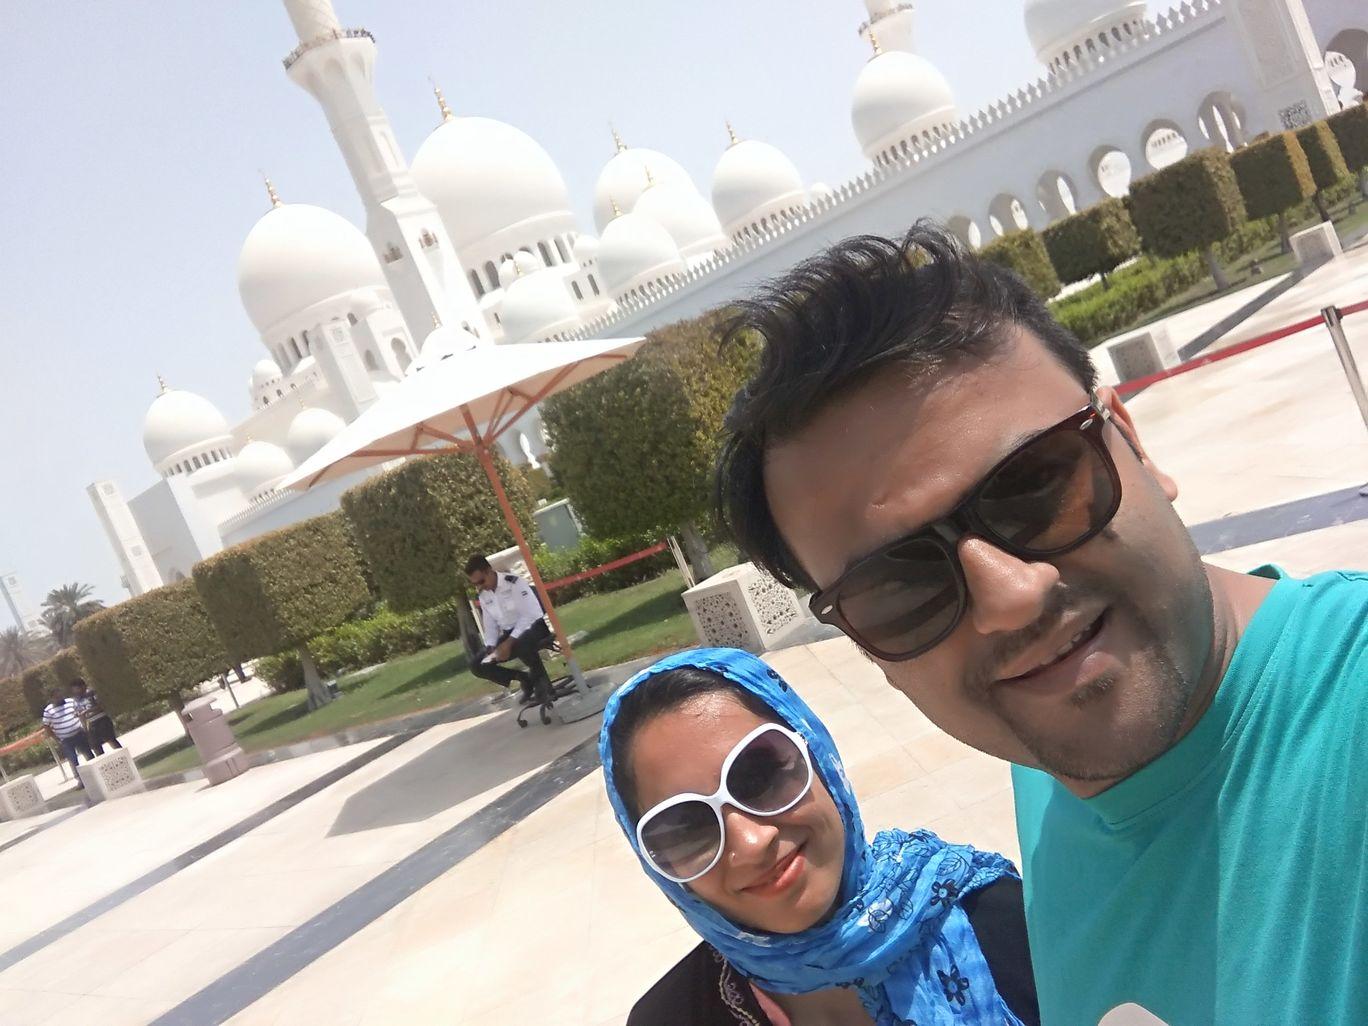 Photo of Mosque Of Sheikh Zayed Bin Sultan the First - 9 - Street - Abu Dhabi - United Arab Emirates By Pragnesh Shah